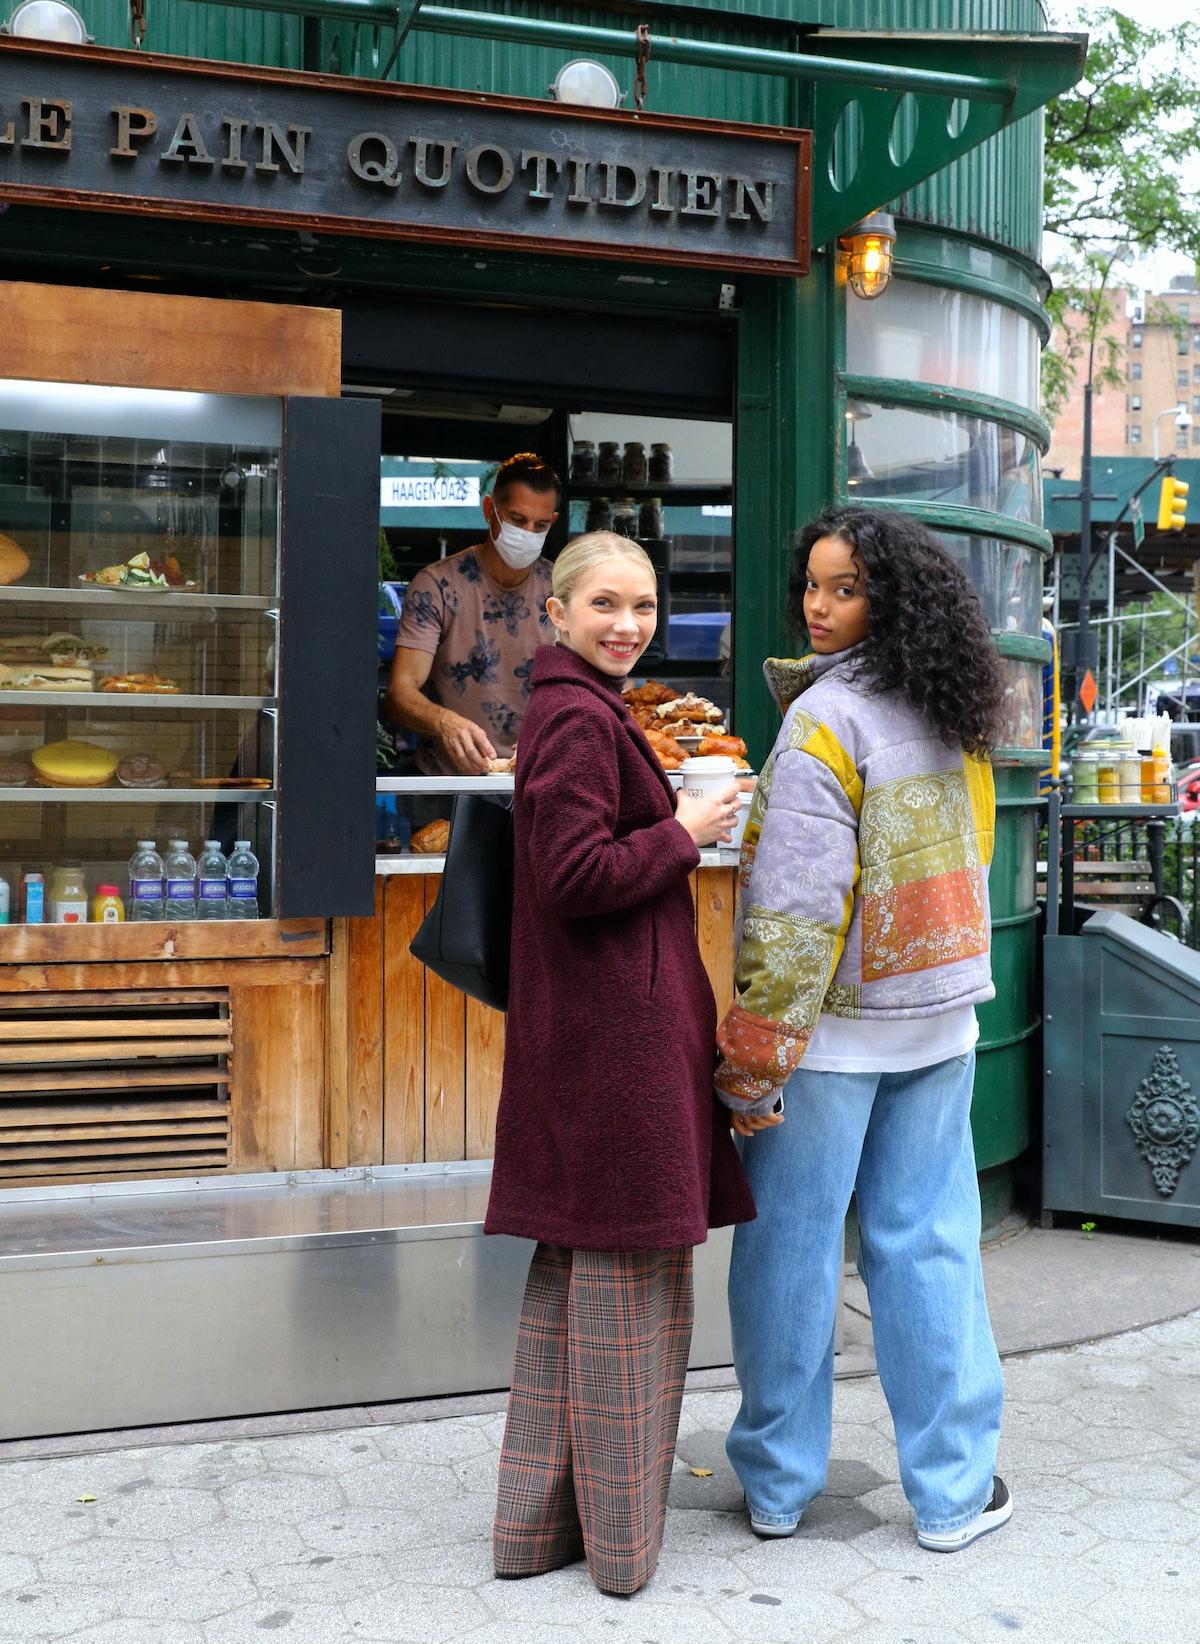 Tavi Gevinson and Whitney Peak on the set of the Gossip Girl reboot